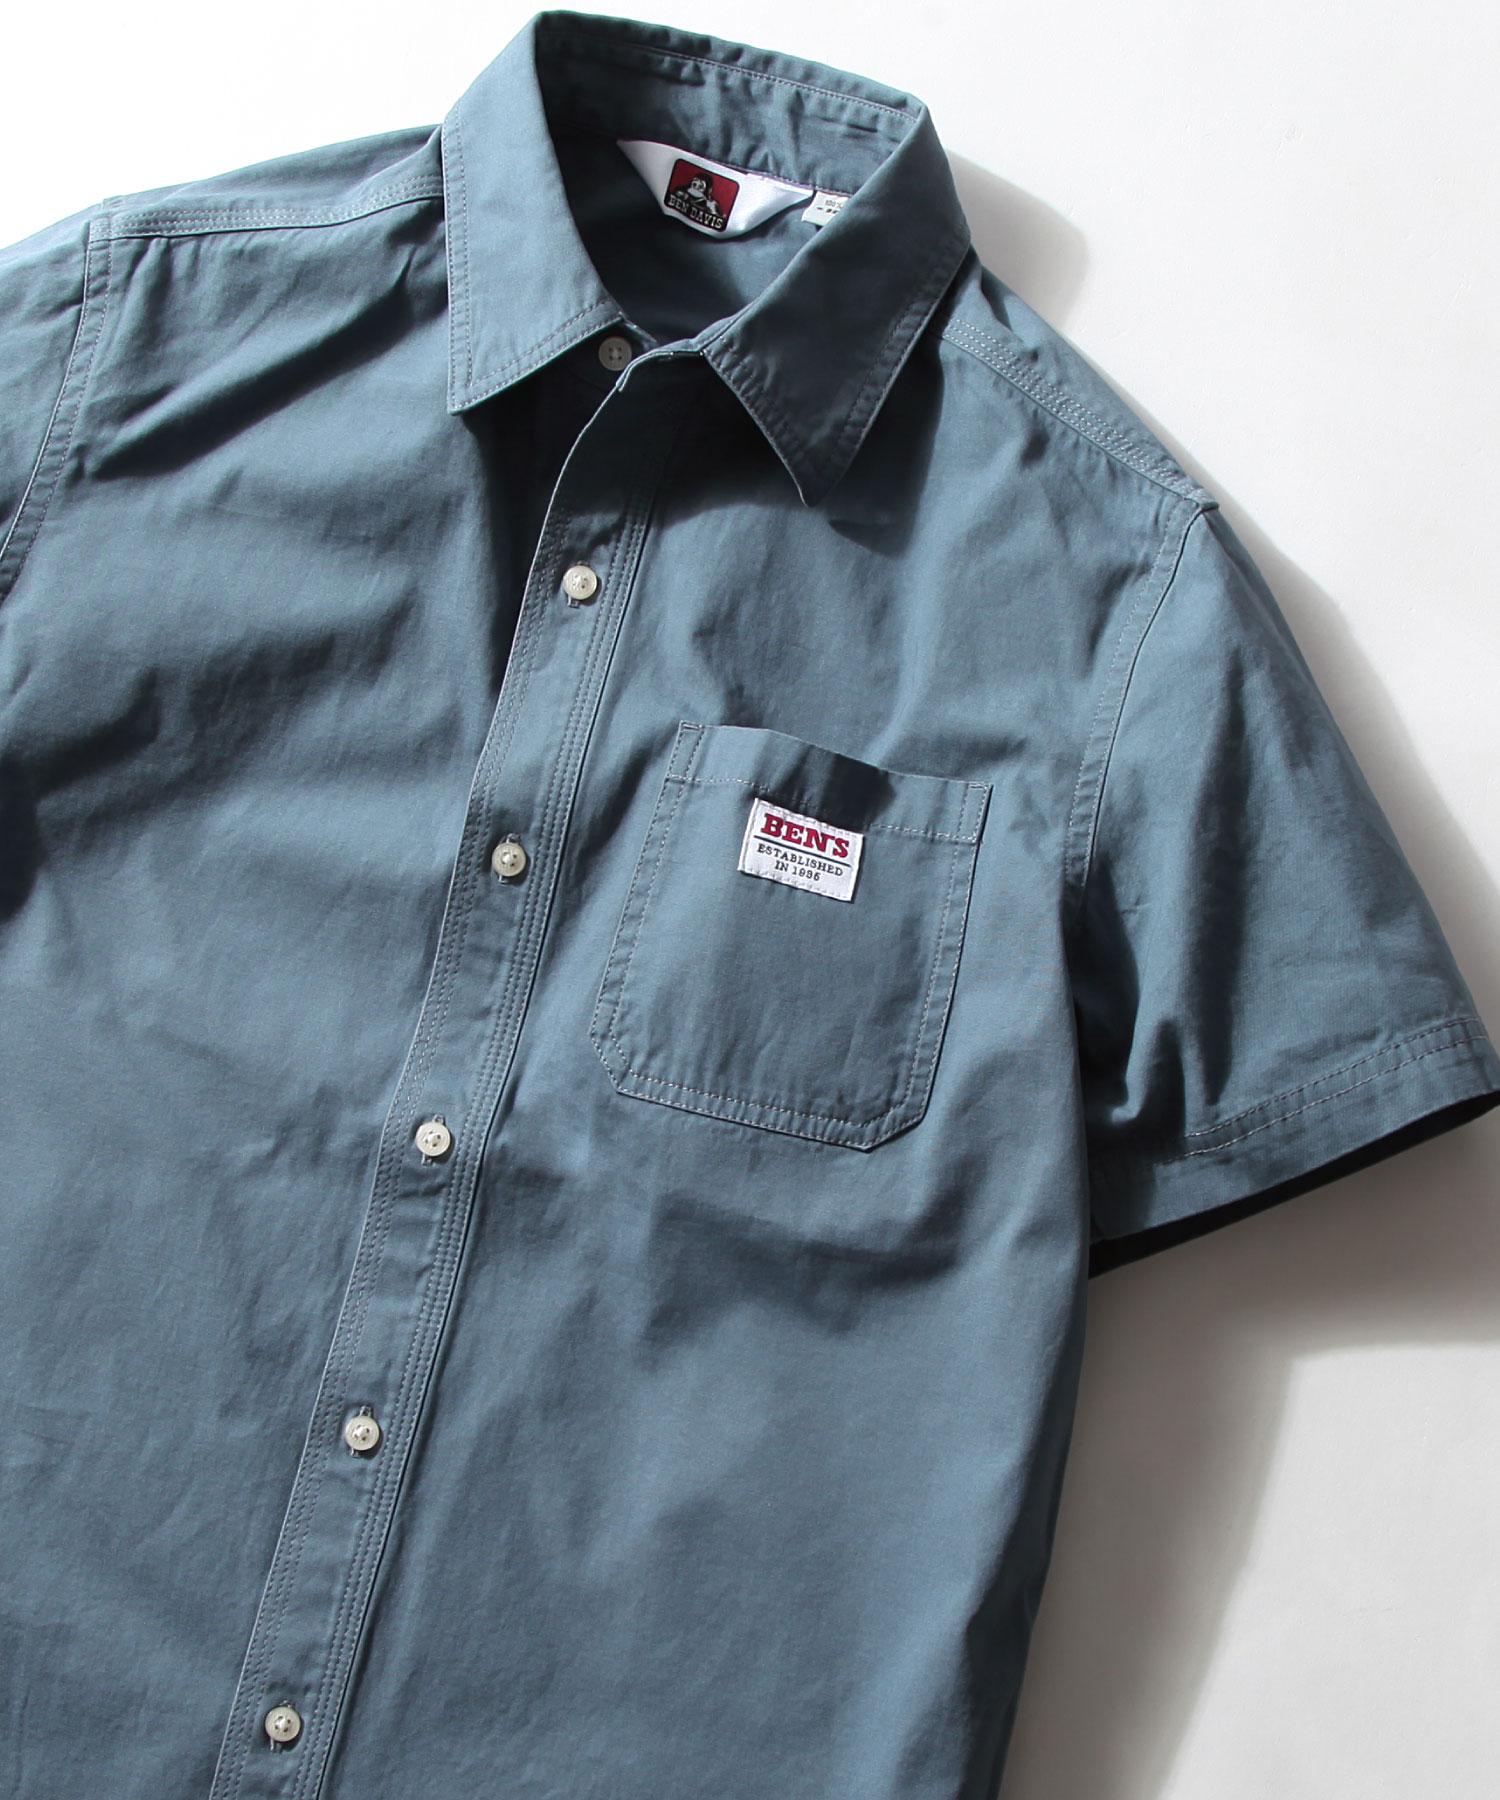 【BEN DAVIS】LOGO名牌刺繡工裝襯衫 短袖 2